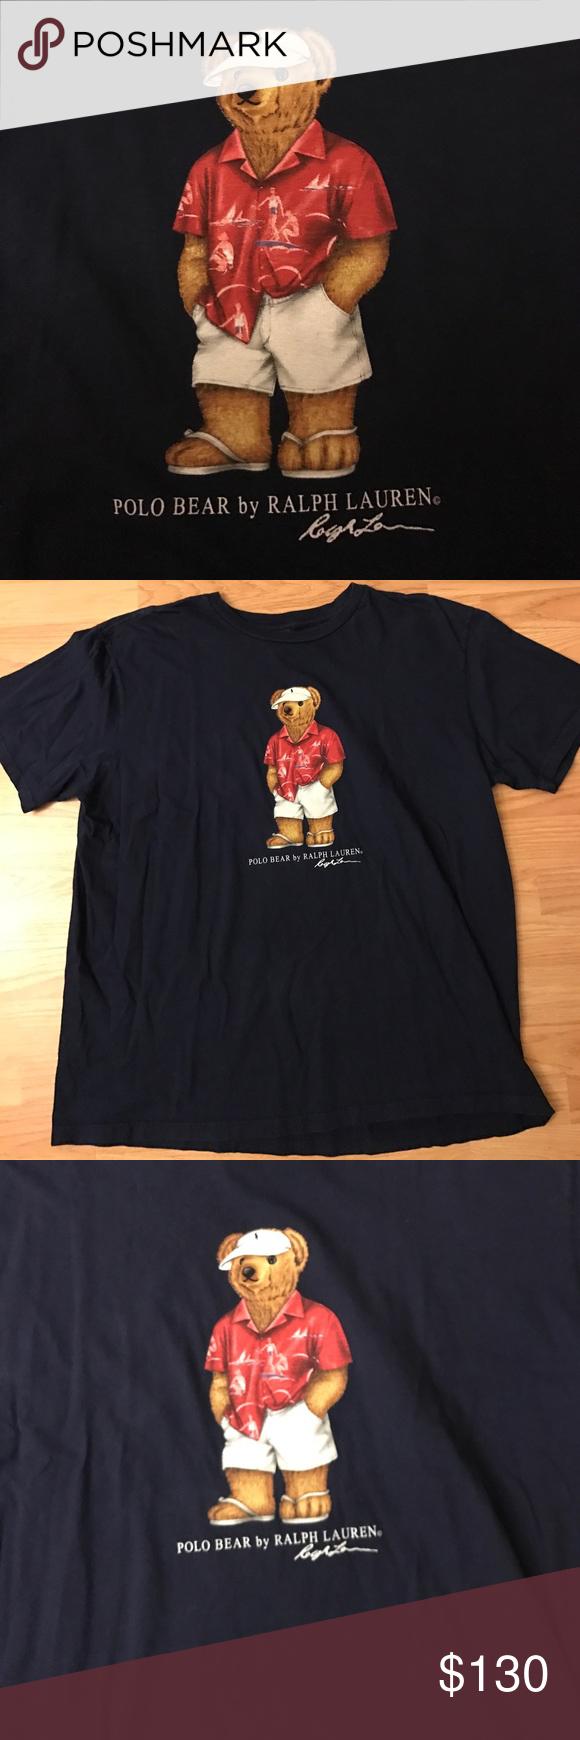 c8118a0fe8a9 Vintage Polo Bear Ralph Lauren Rare! Vintage polo bear by Ralph Lauren.  Size XL. In amazing vintage condition. Polo by Ralph Lauren Shirts Tees -  Short ...